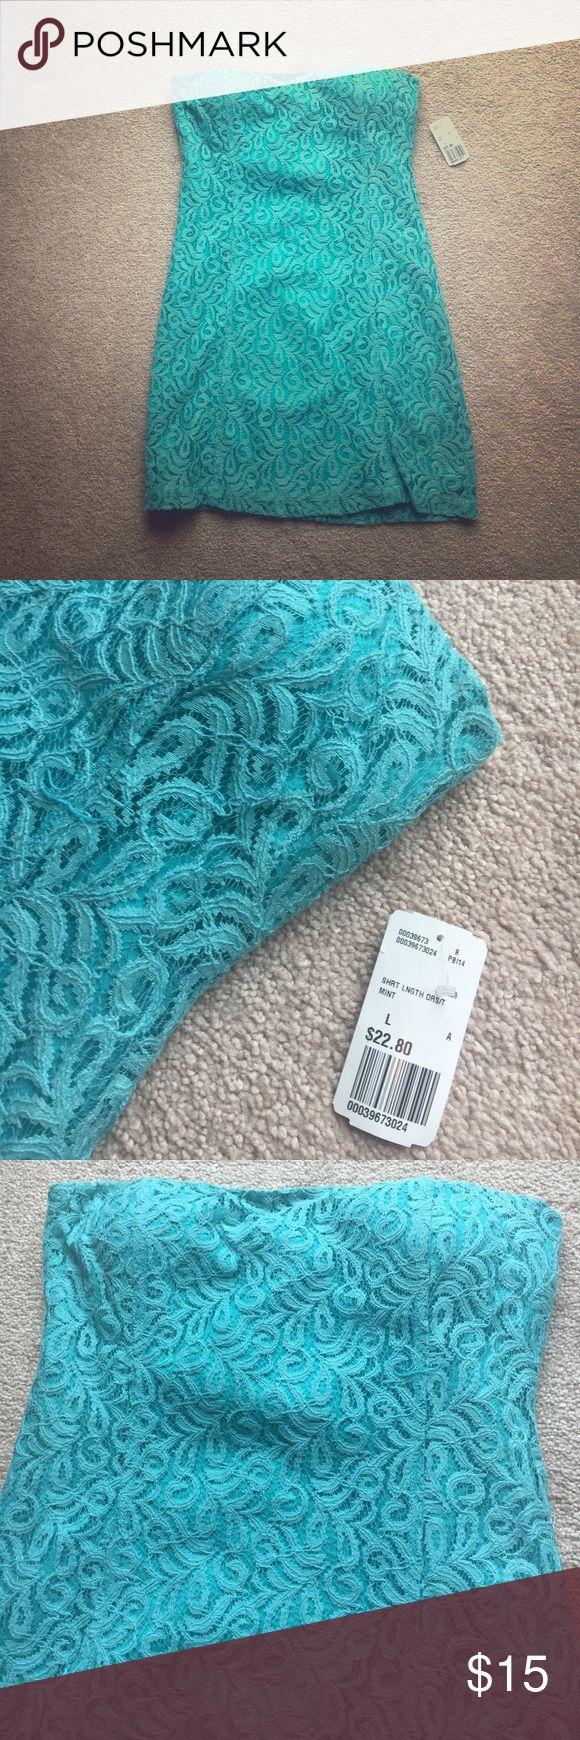 17 Best ideas about Turquoise Lace Dresses on Pinterest ...